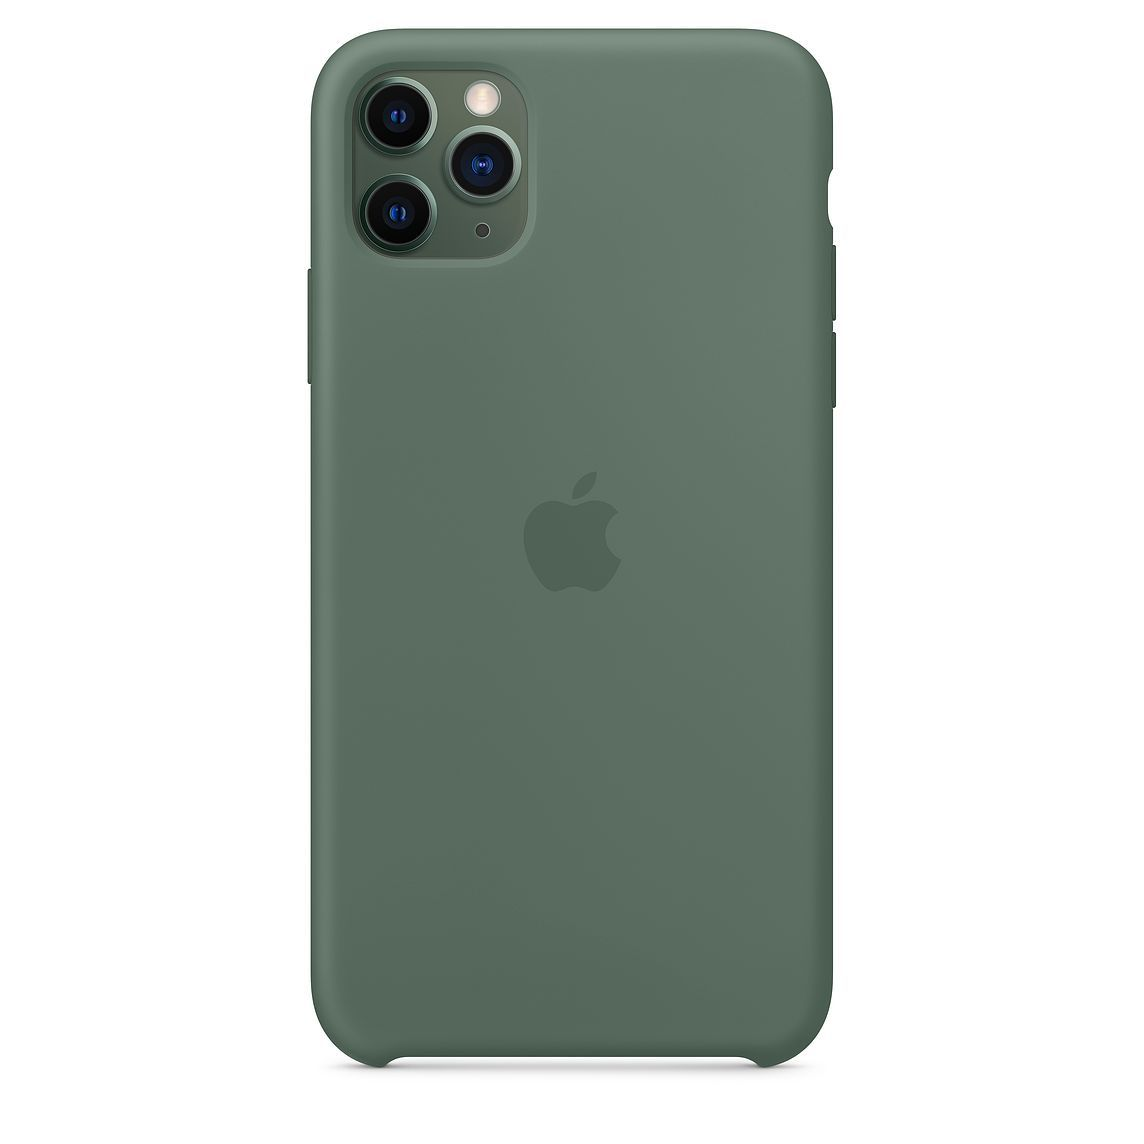 Iphone 11 Pro Max Silicone Case Clementine Orange Apple Iphone Iphone 11 Apple Phone Case